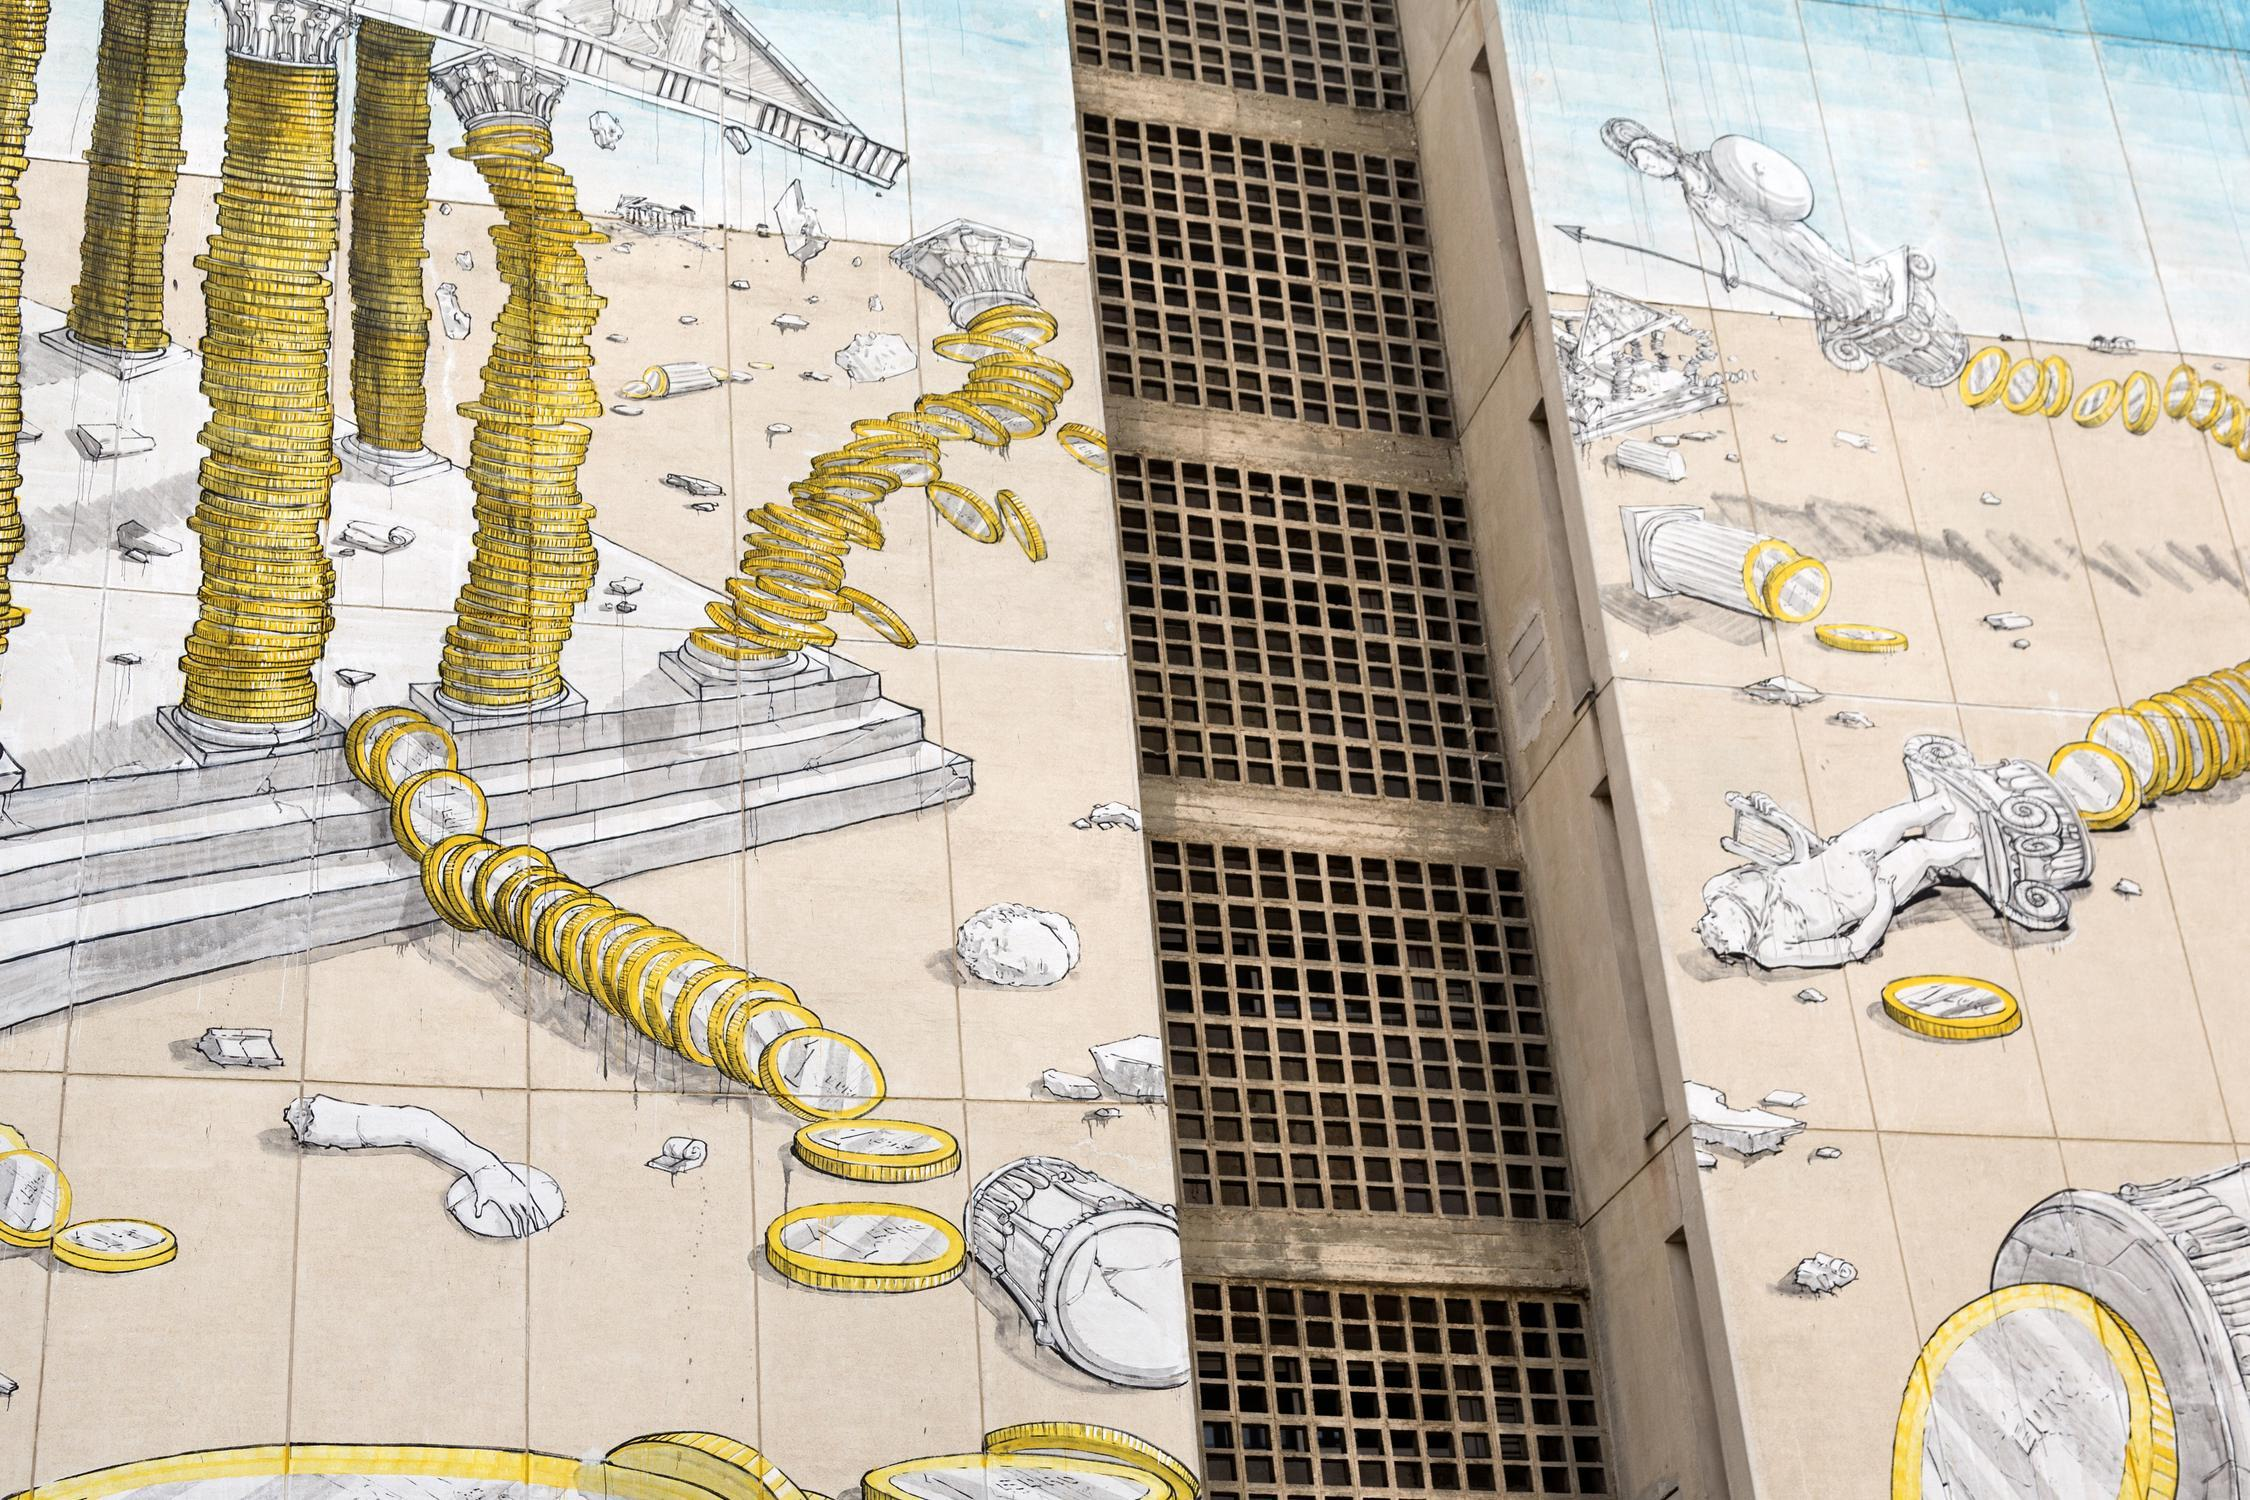 "A mural by graffiti artist ""Blu"" that depicts the Greek ailing economy on a wall in the northern Greek city of Thessaloniki. / Μια τοιχογραφία από τον καλλιτέχνη γκράφιτι ""Blu"" που απεικονίζει την προβληματική Ελληνική οικονομία σε έναν τοίχο στην Θεσσαλονίκη."